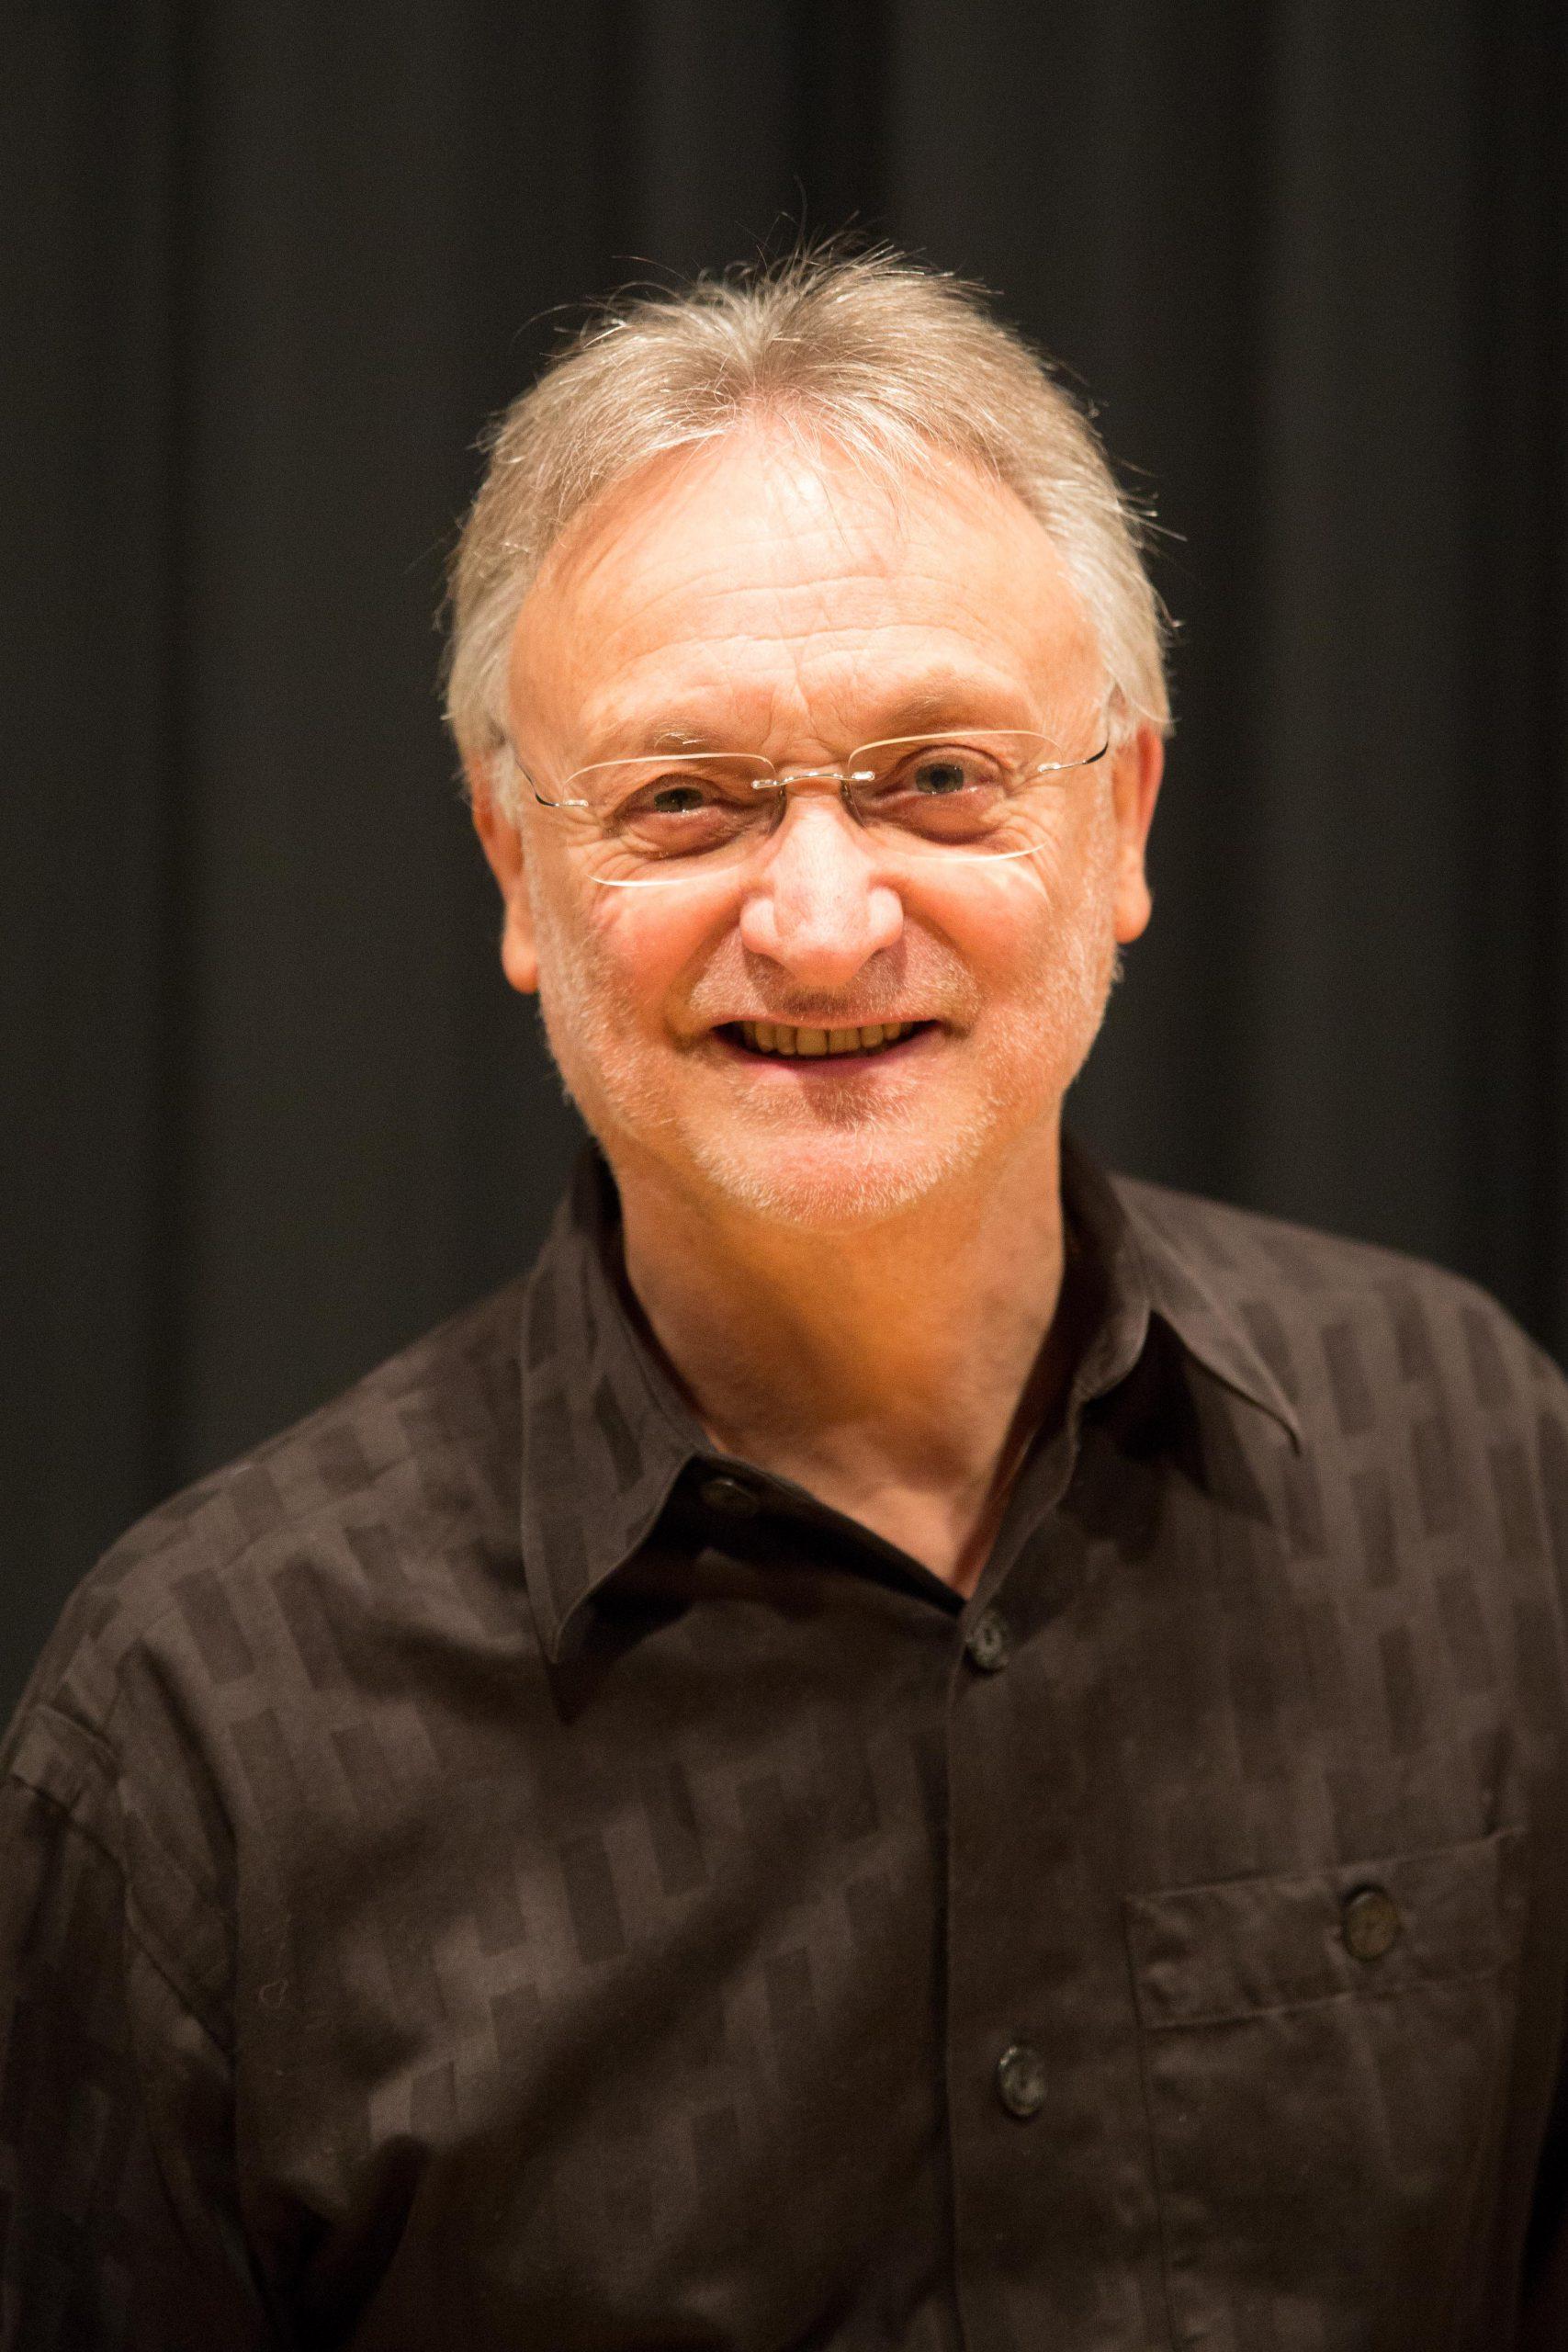 Gerald Giesel